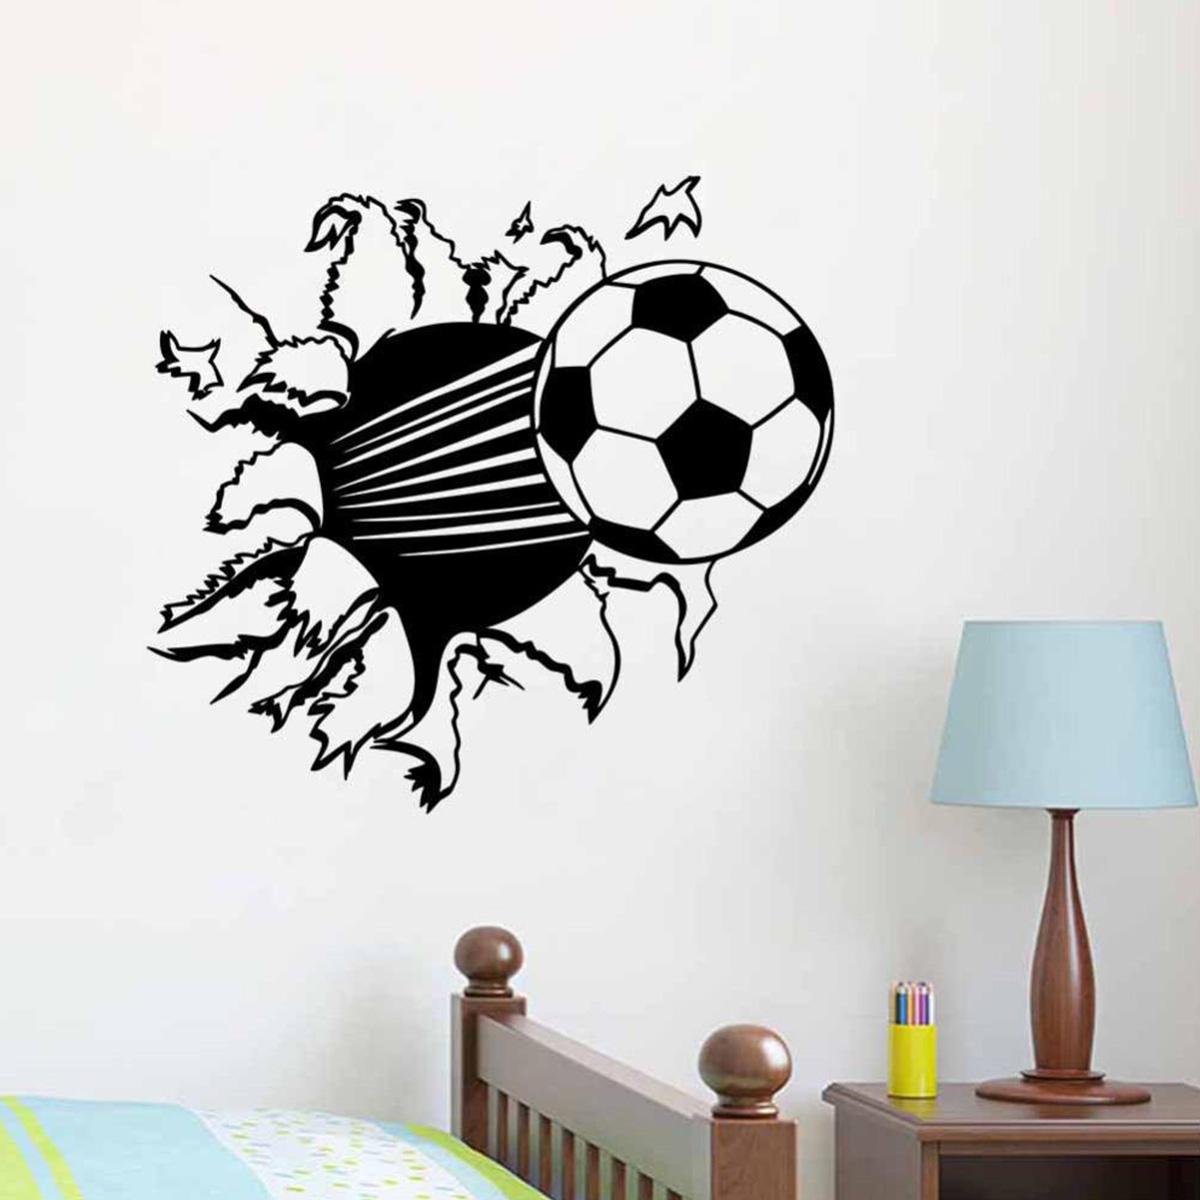 Adesivo de parede bola de futebol 2 Dibujos para paredes